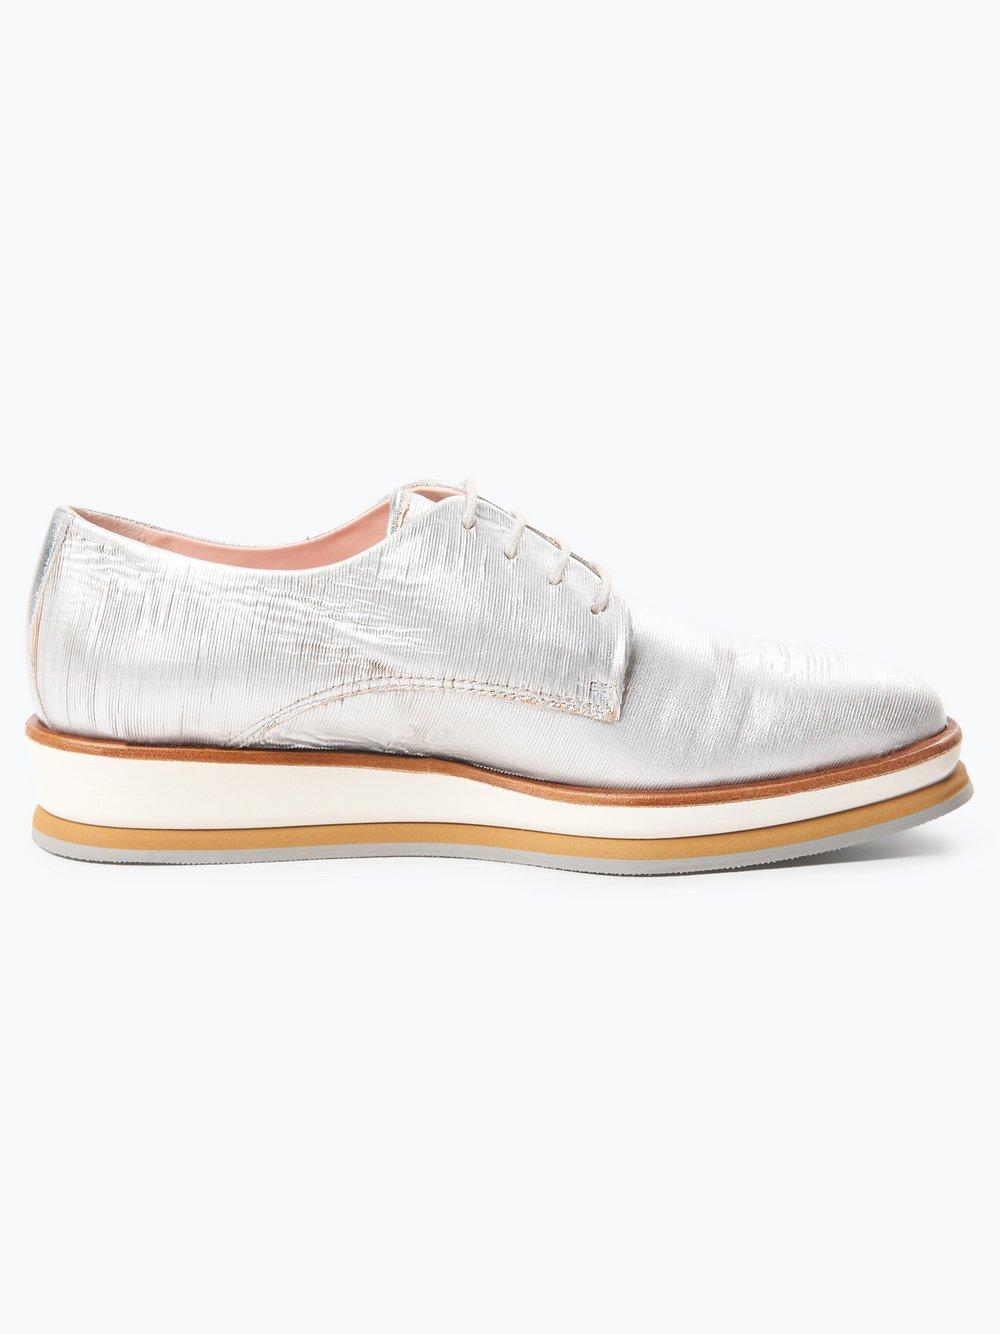 differently aa264 25188 Marc Cain Bags & Shoes Damen Schnürschuhe aus Leder online ...